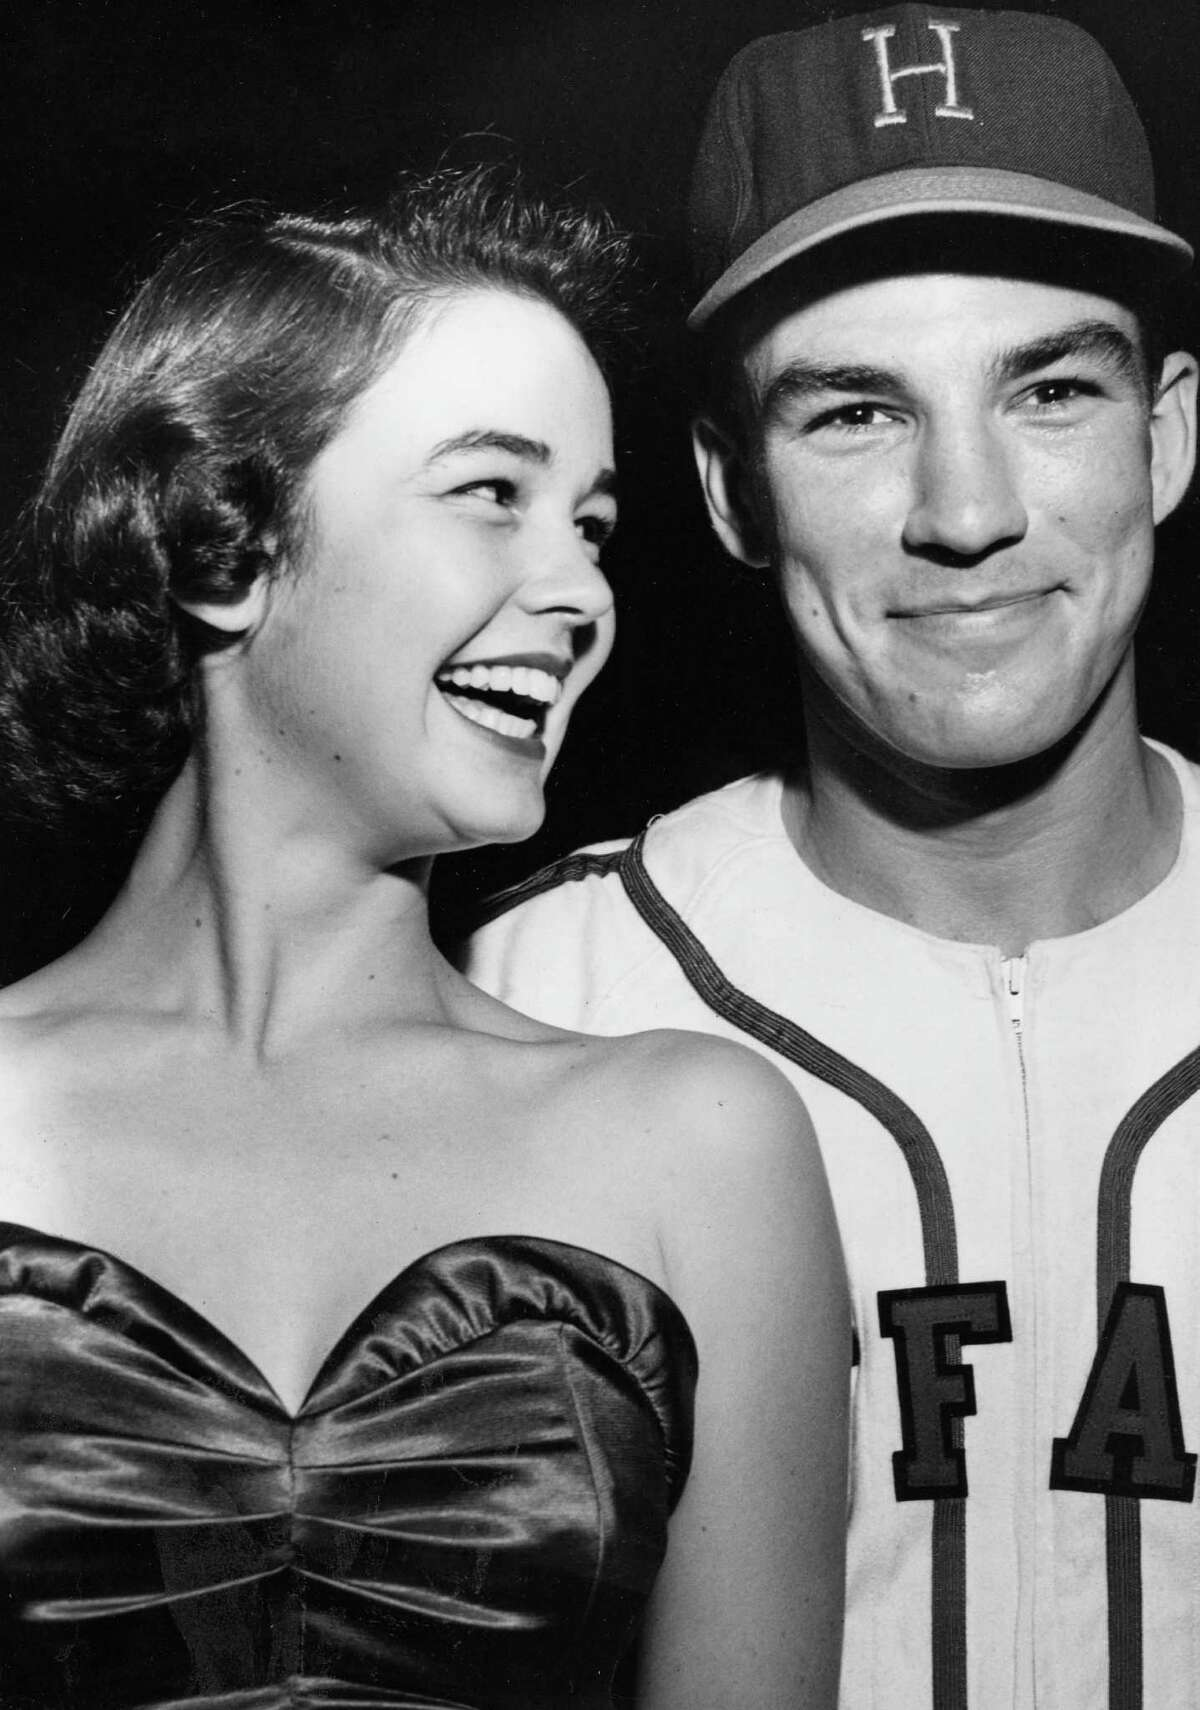 Kathy Crosby, Aug. 29, 1951.